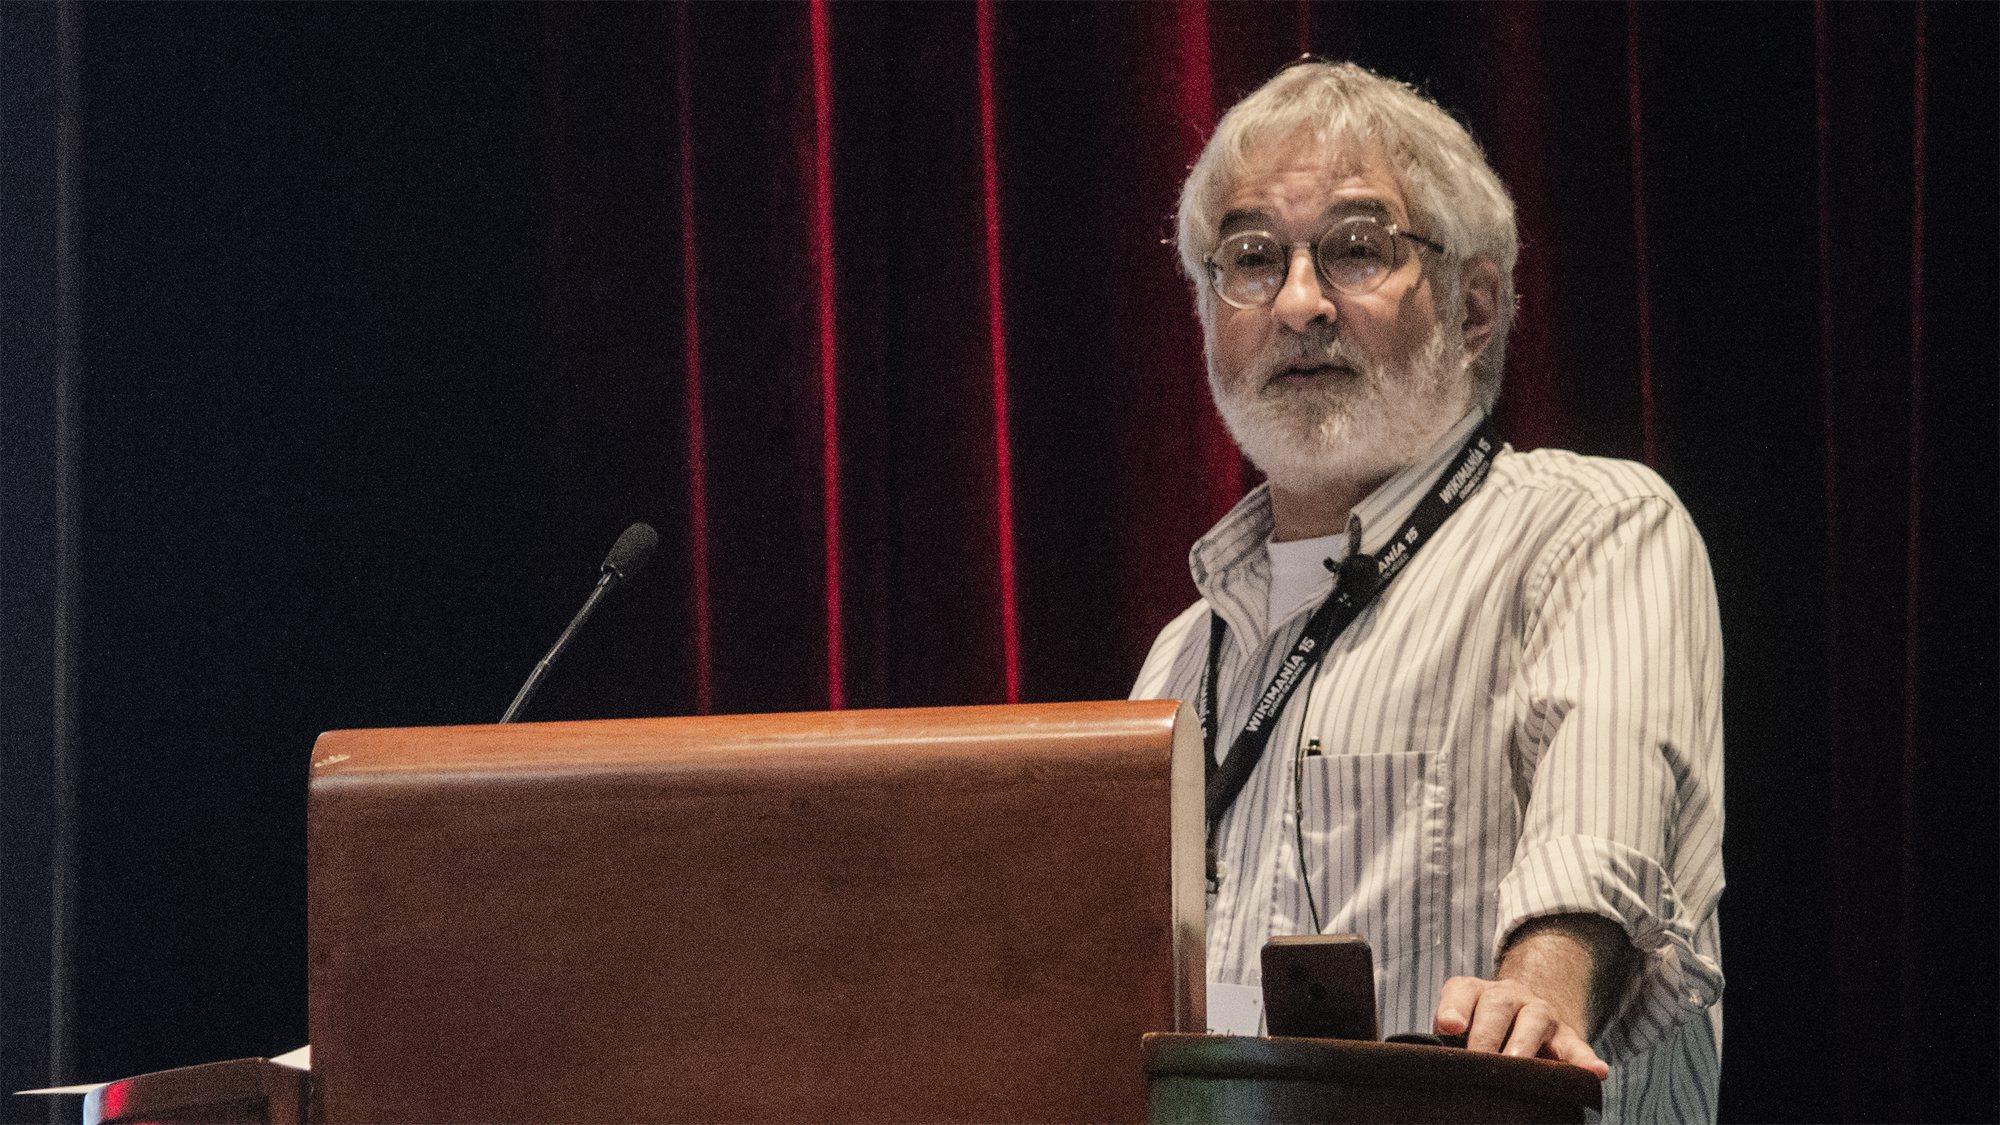 Edward Zalta presenting to the Wikimania conference.